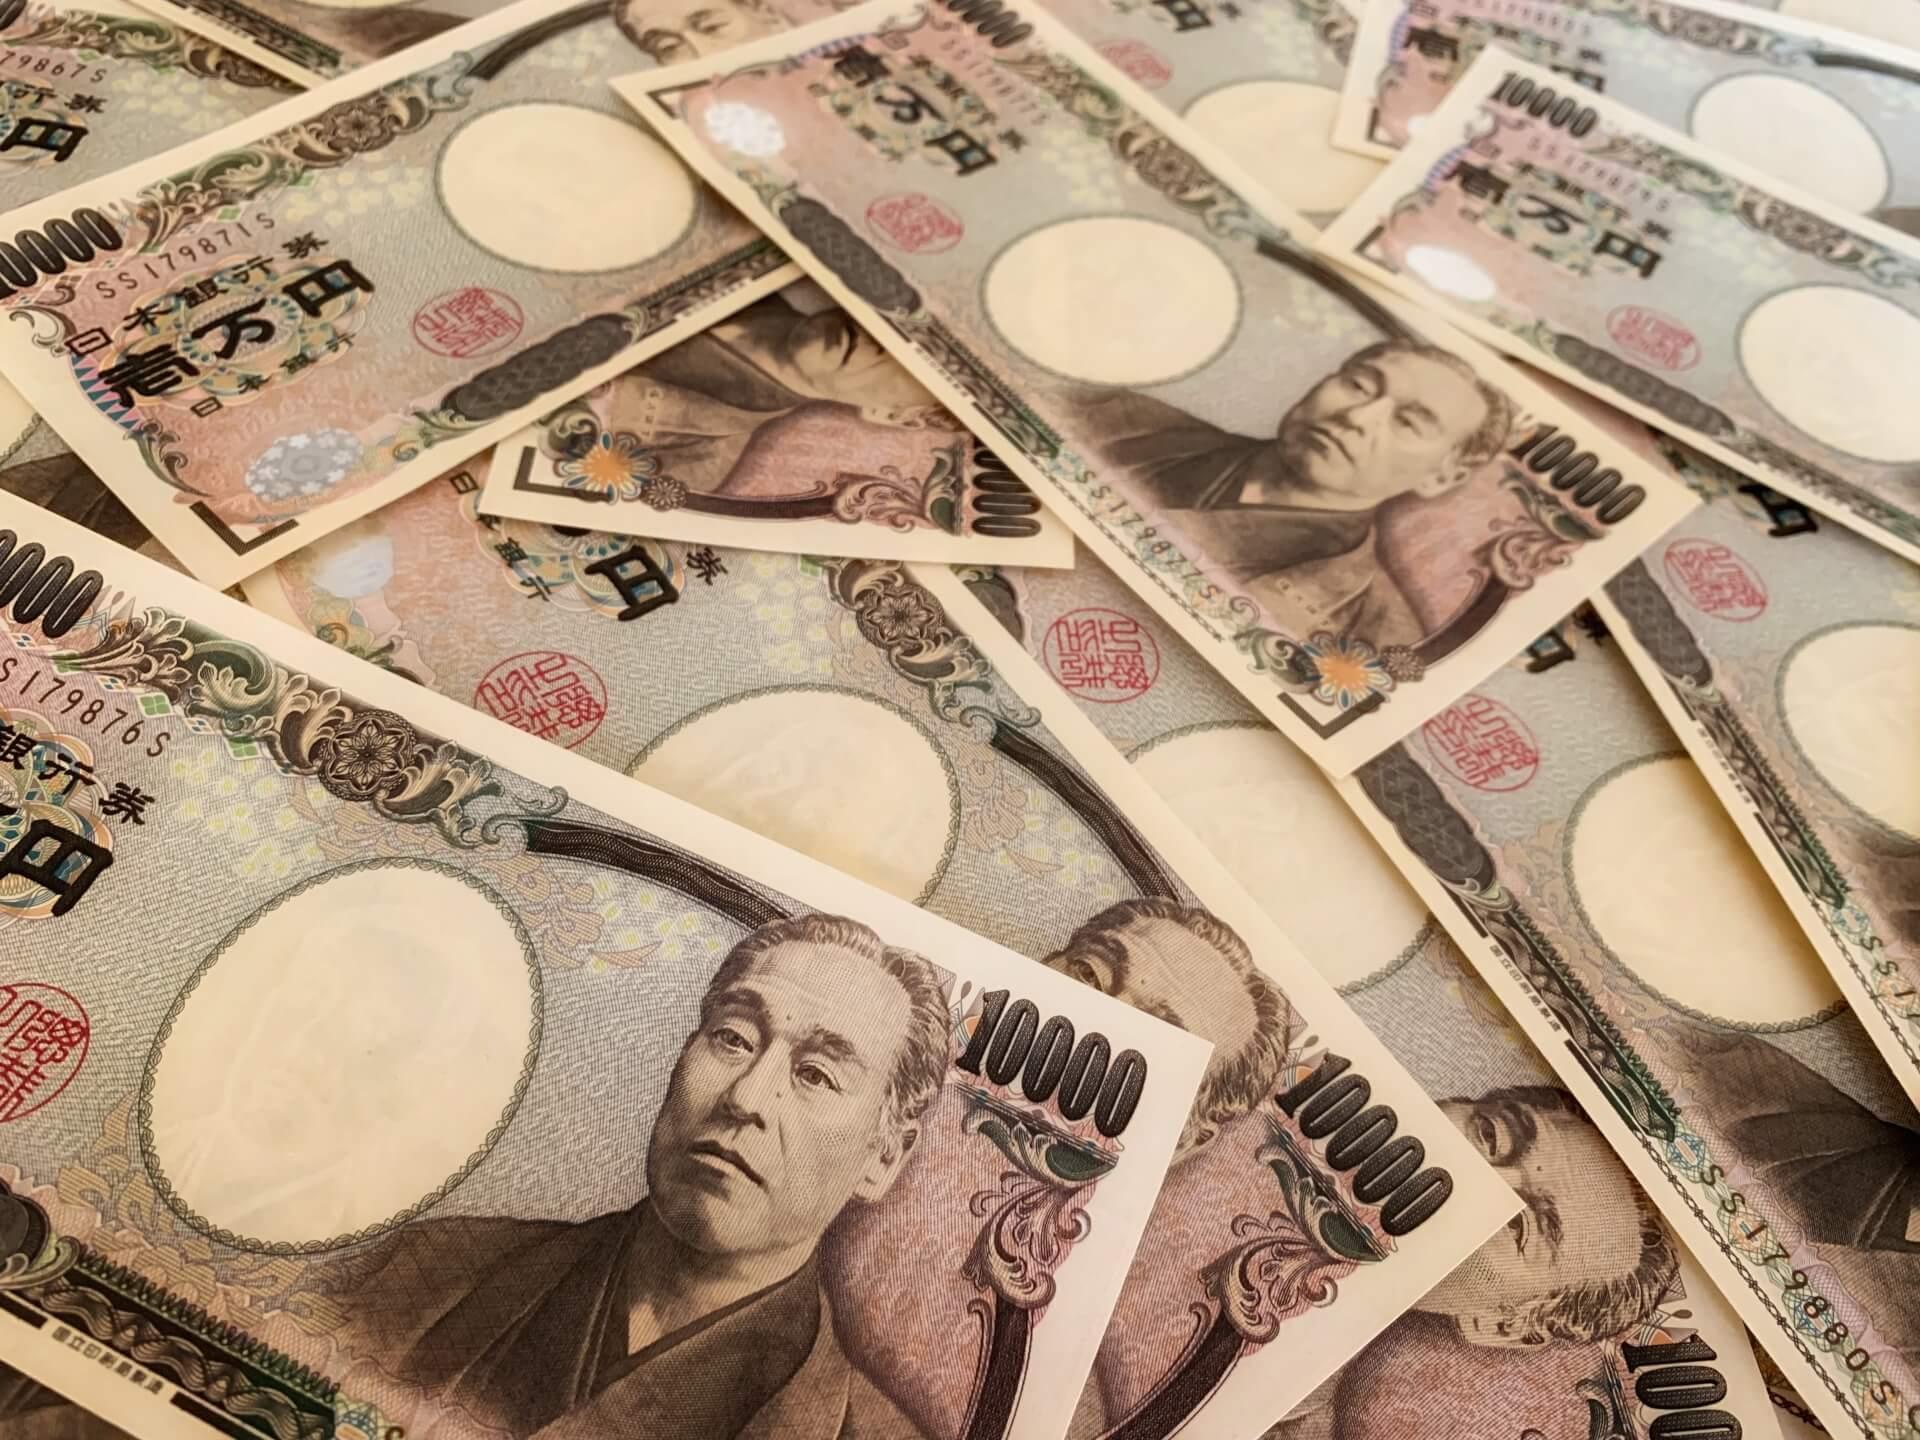 【MIU404】4話あらすじネタバレ感想!1億円を持って逃げる女、その結末は!?